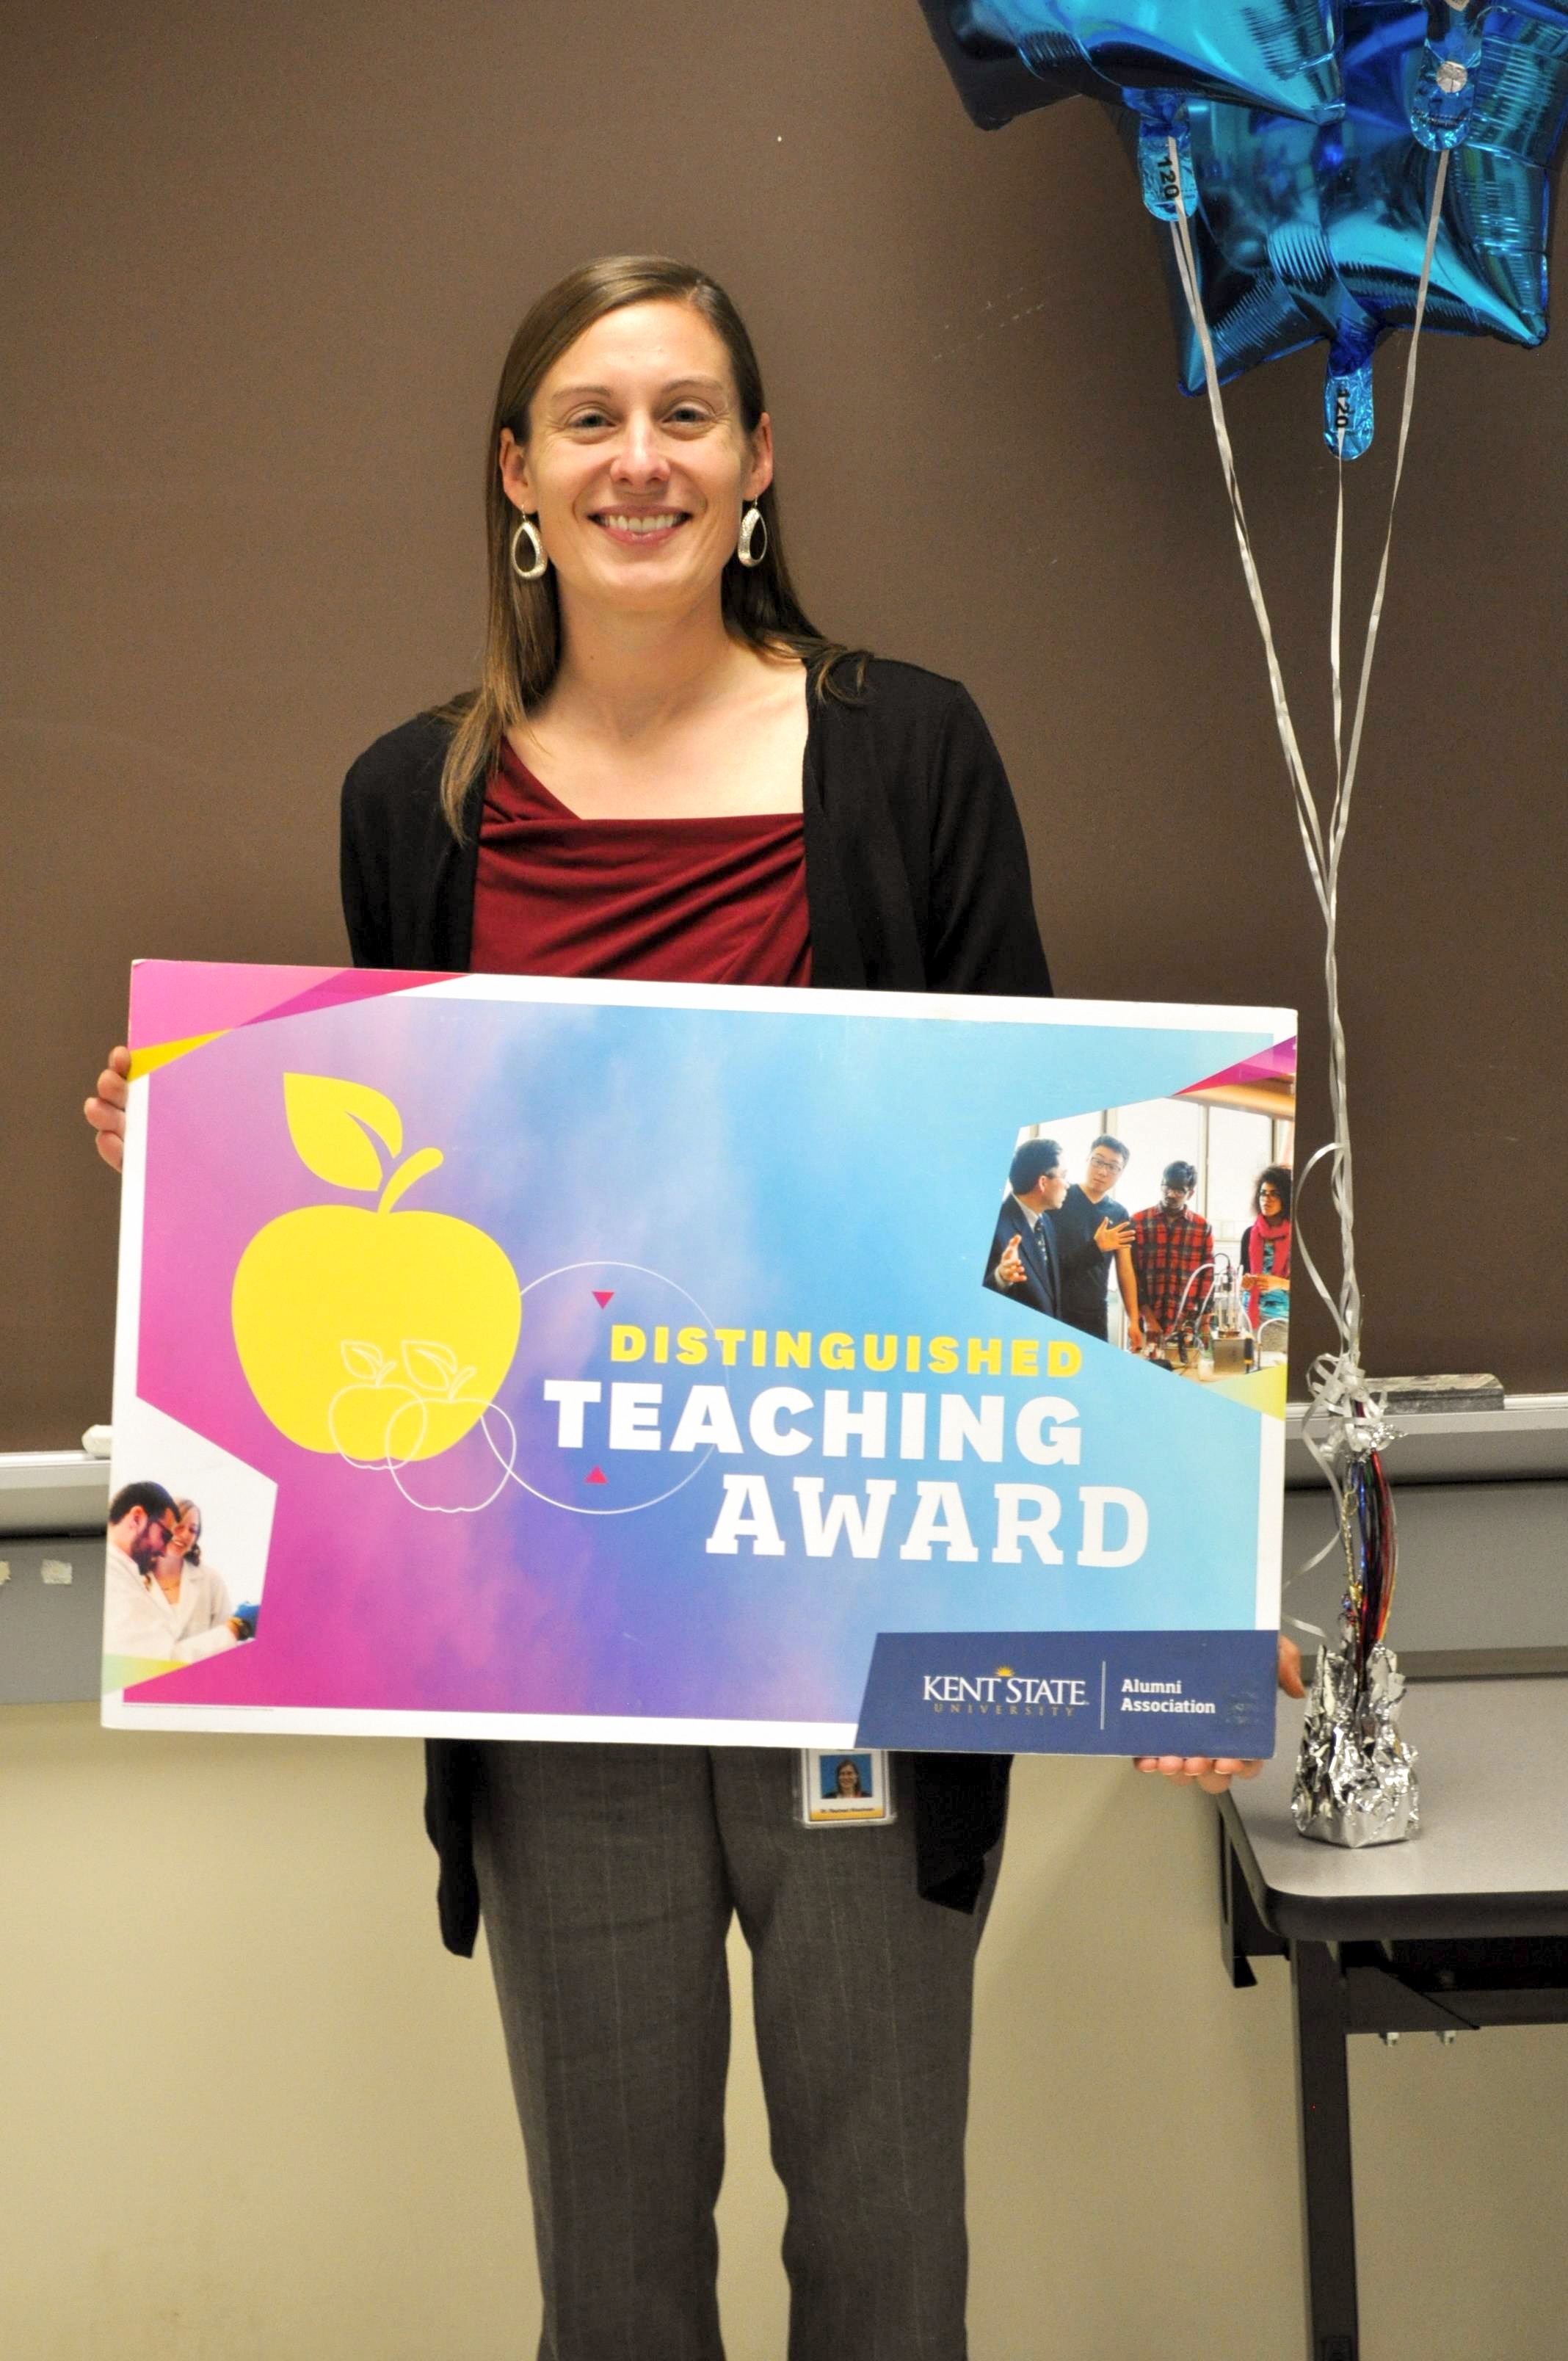 Rachael Blasiman wins the Distinguished Teaching Award